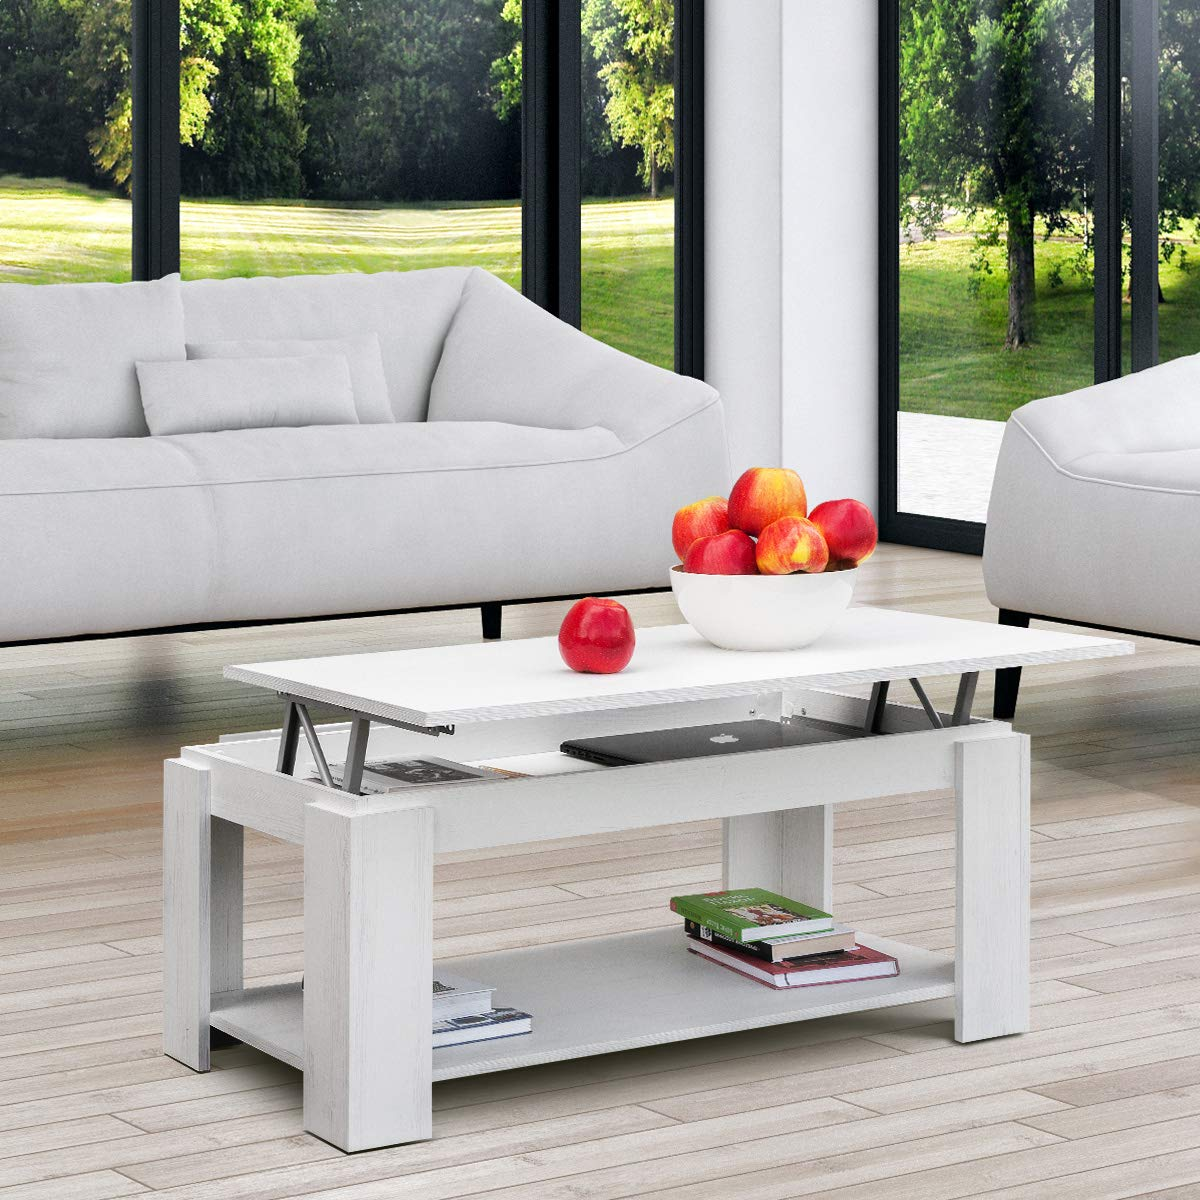 COMIFORT Mesa de Centro Elevable - Mueble Extensible con Revistero ...